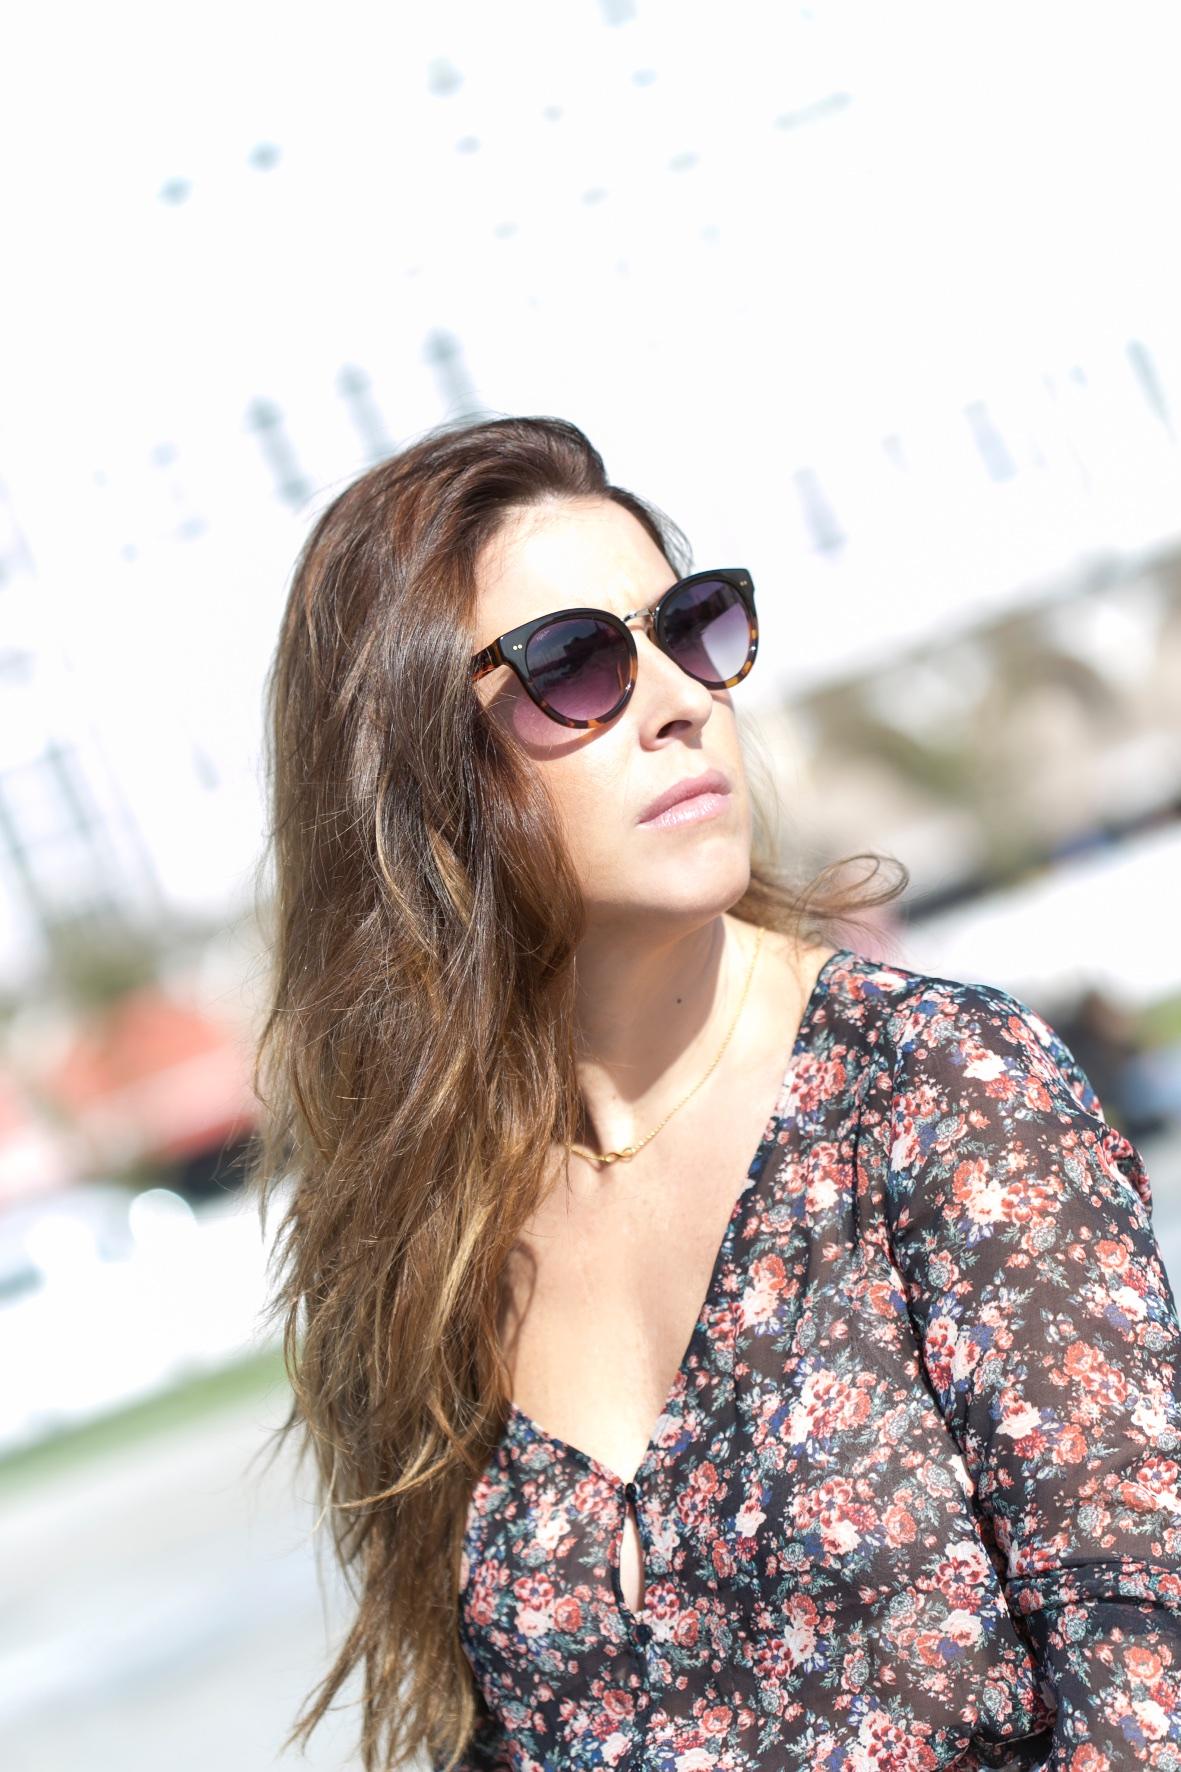 alainafflelou-ferrolterra-descalzaporelparque-gafas-moda-fashion-sunglasses